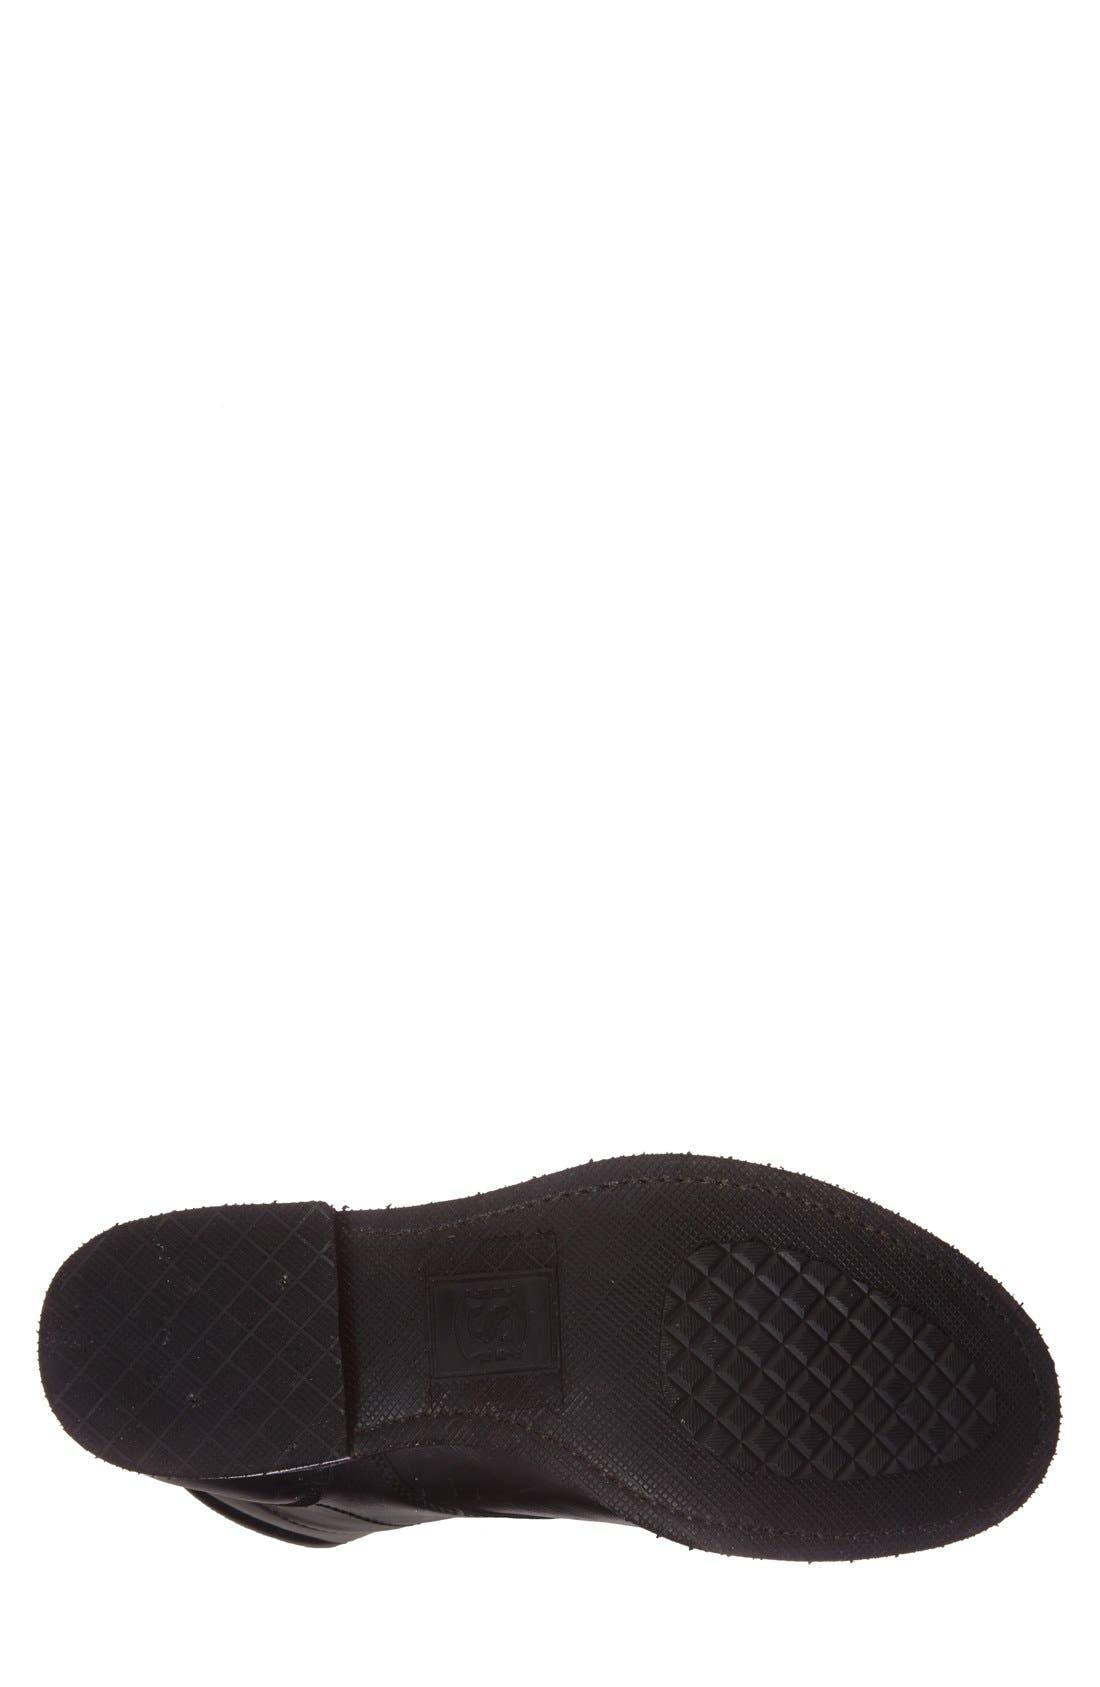 Alternate Image 4  - Sendra 'Traveler' Round Toe Boot (Men)